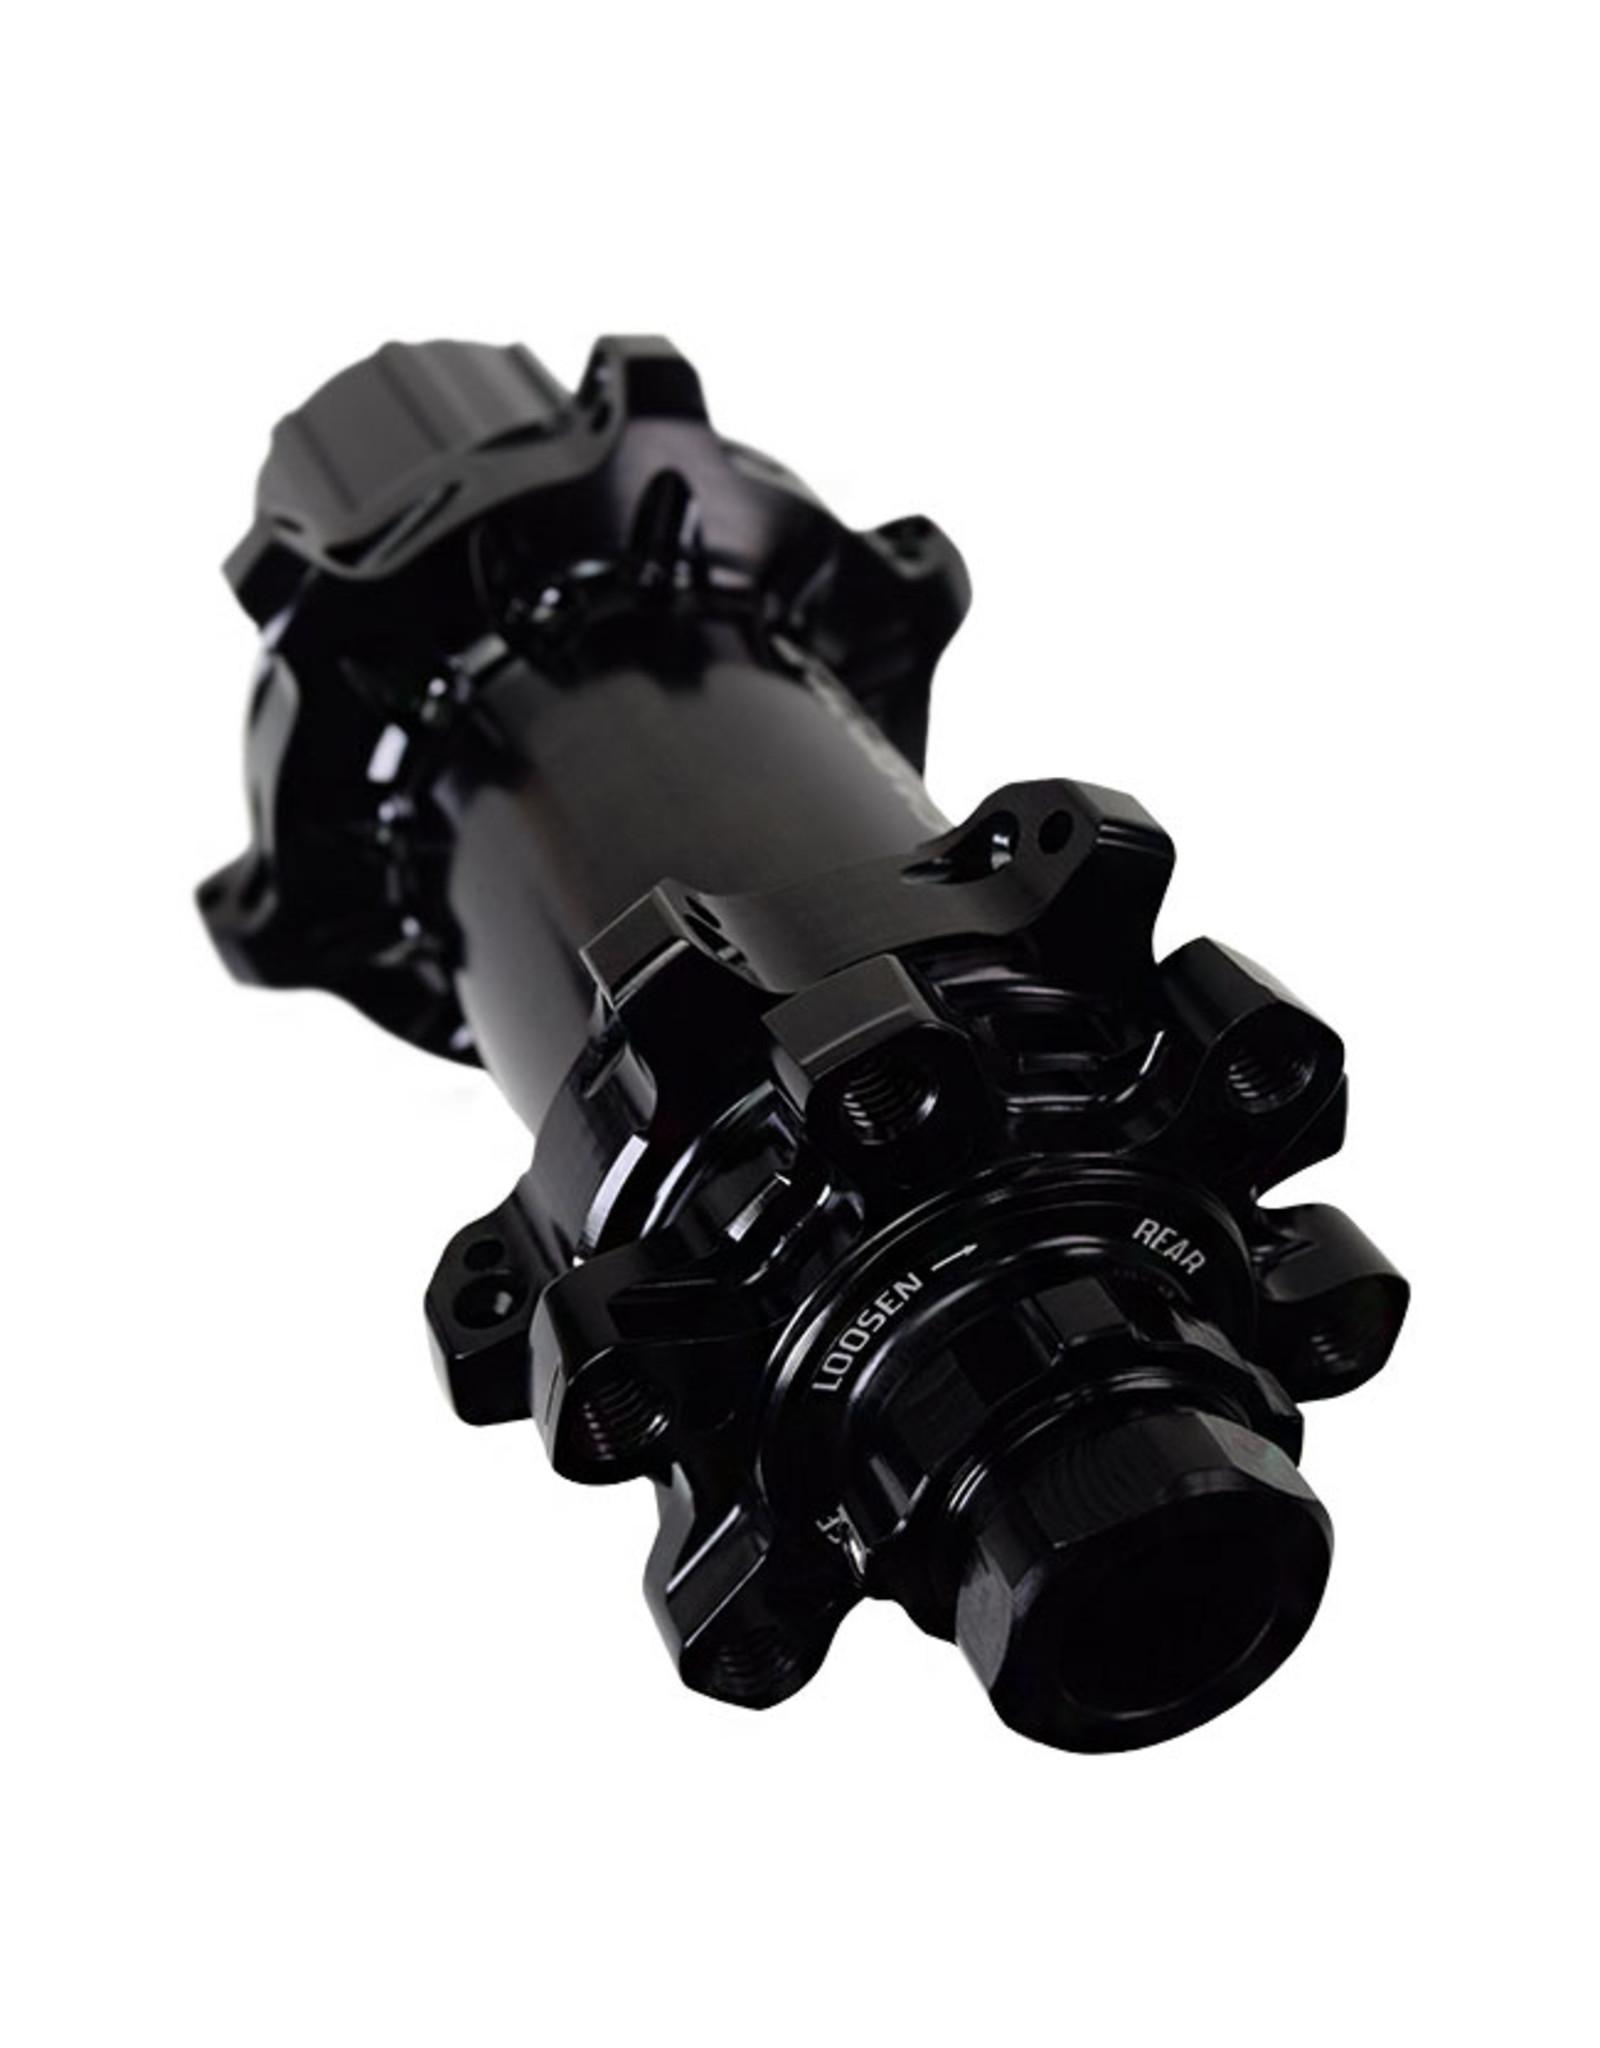 Carbon-Ti Carbon-Ti X-Hub SP 6-bolt Rear Disc Hub